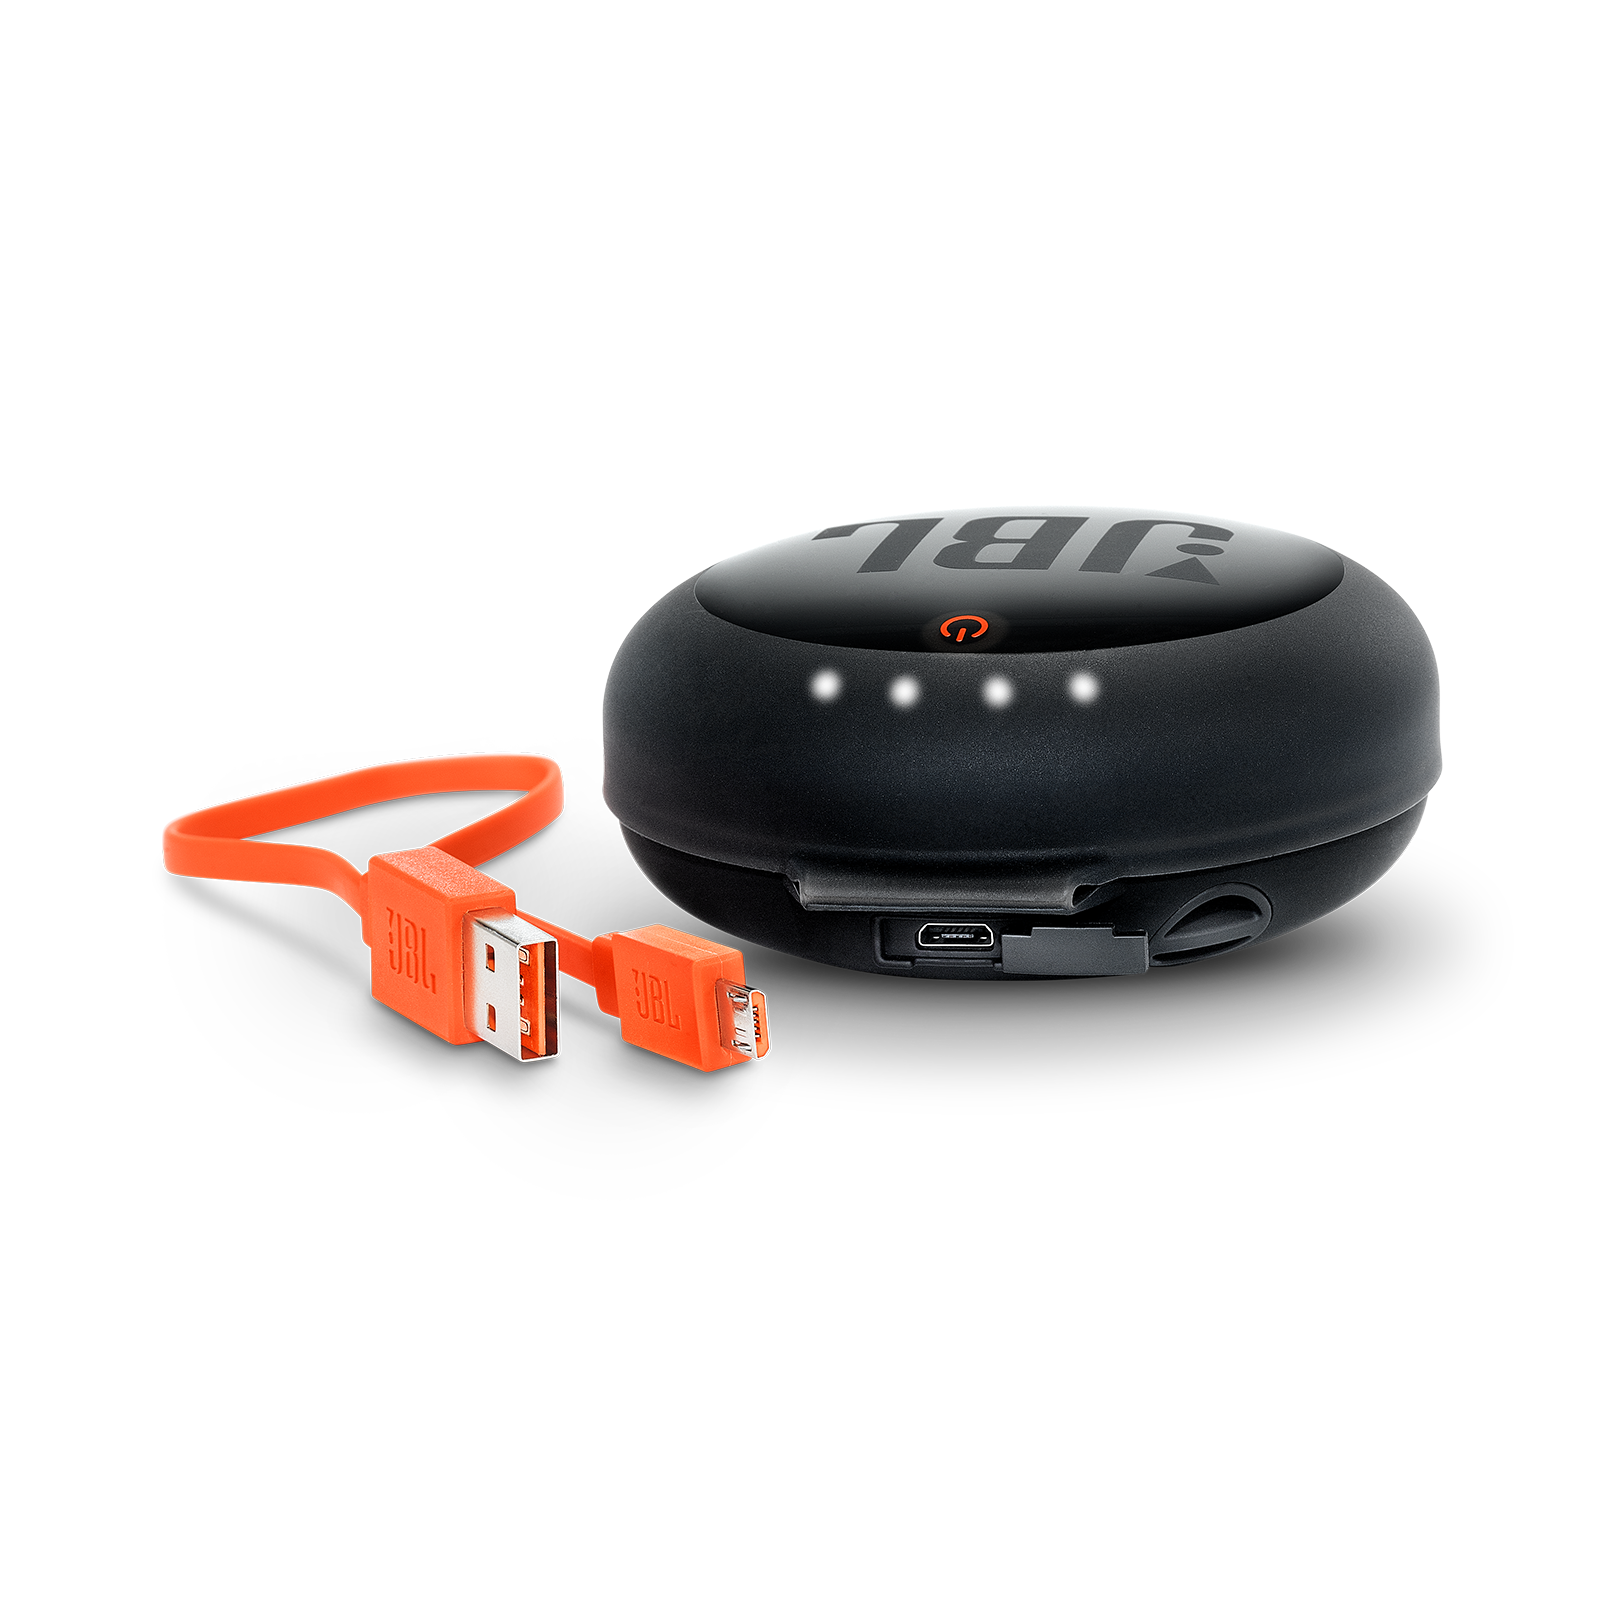 JBL Headphones Charging Case - Black - Headphones charging case - Detailshot 1